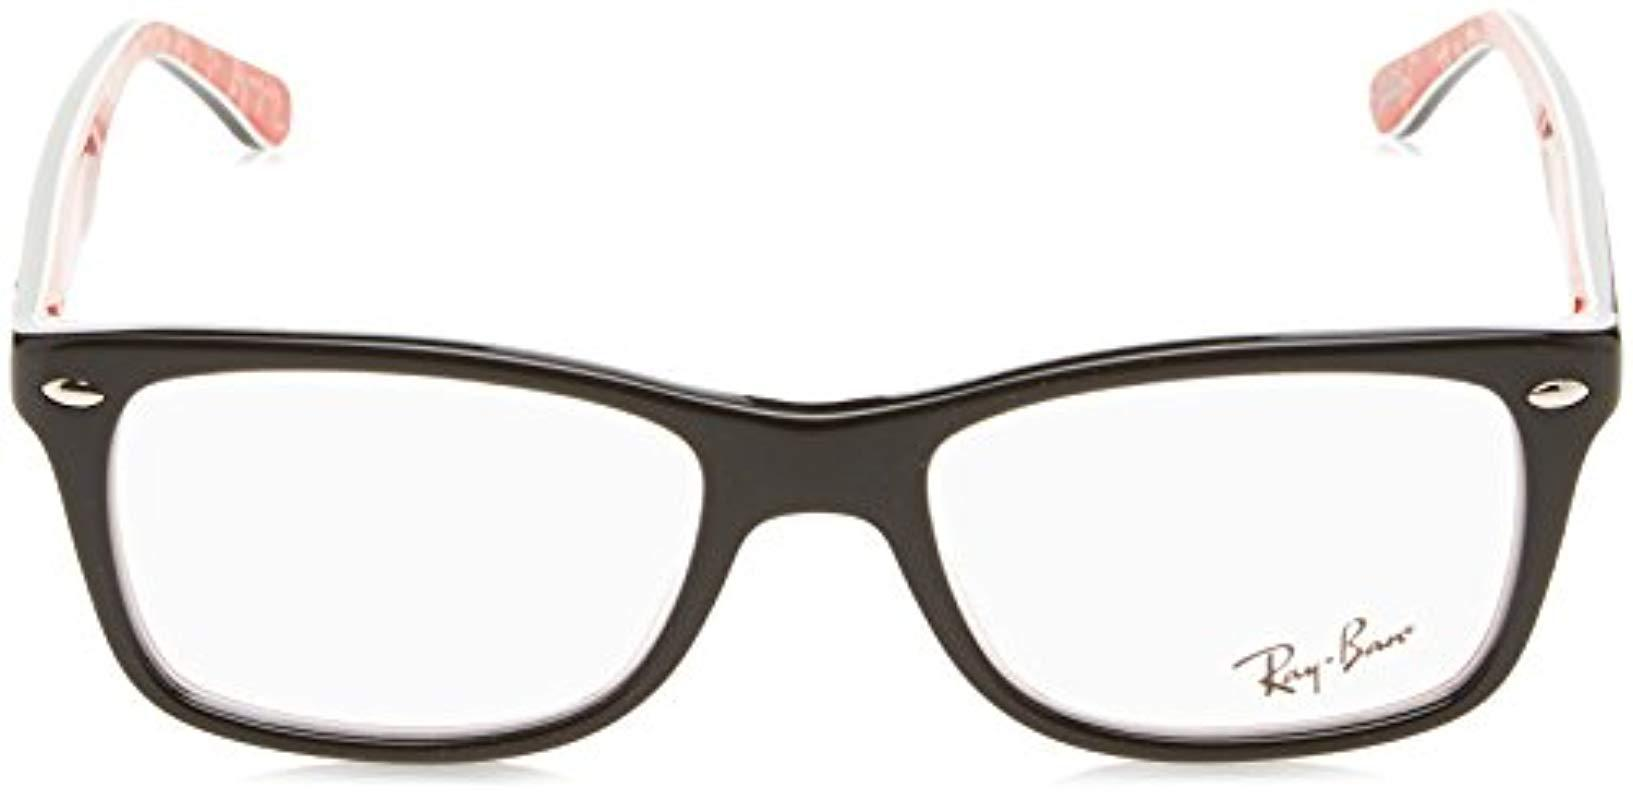 f6a48eacc232c2 Ray-Ban Rayban 0rx 5228 5405 53 Optical Frames, Black in Black - Lyst